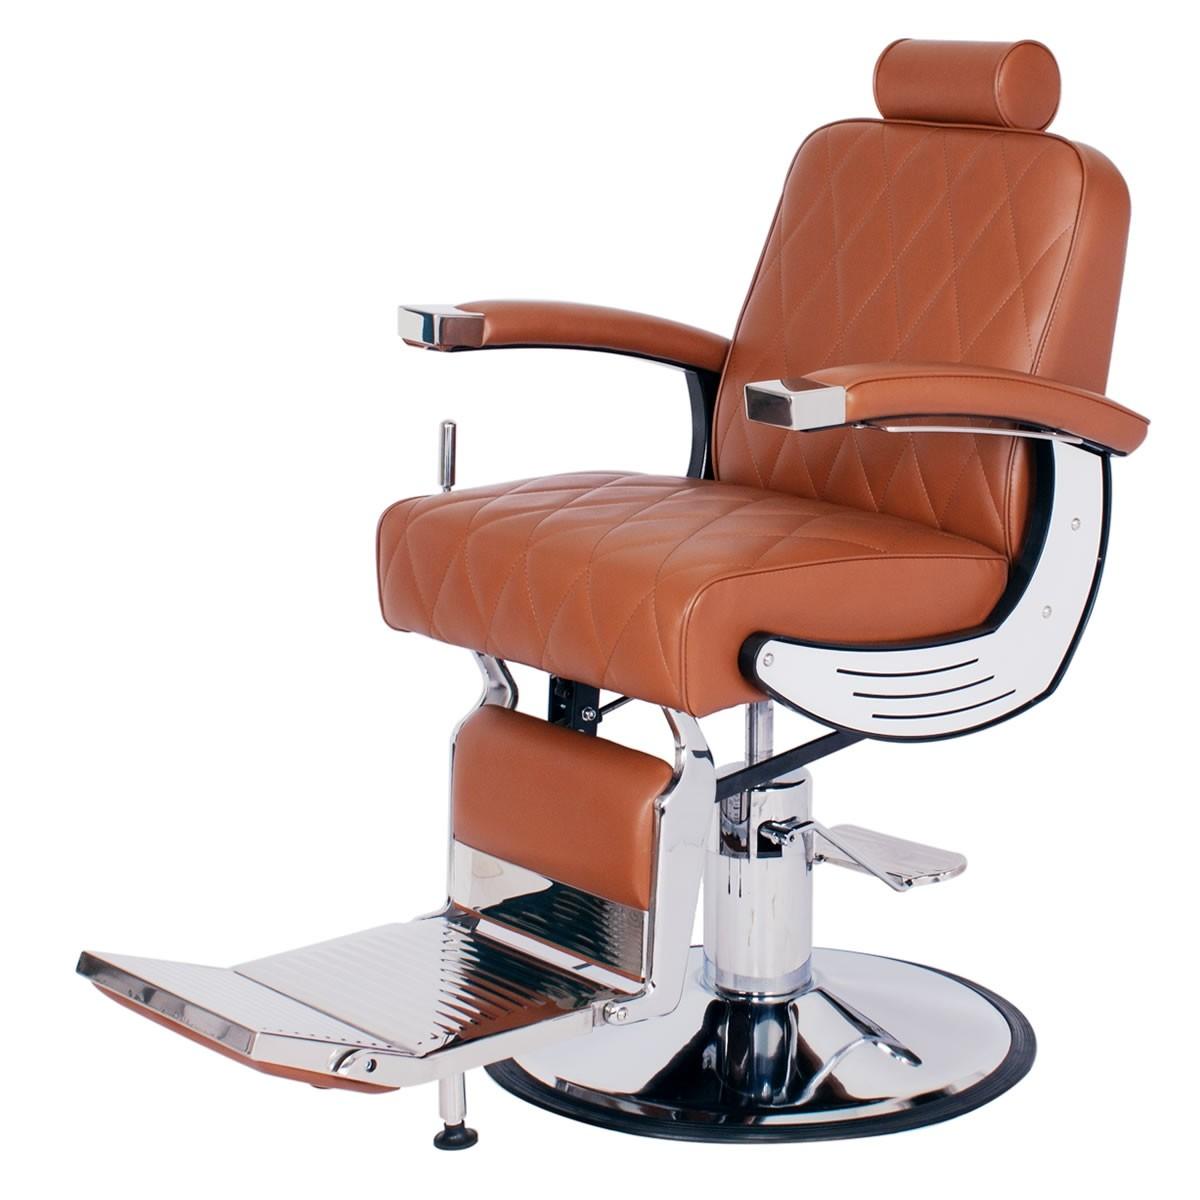 """BARON"" Heavy Duty Barber Chair in Chestnut"